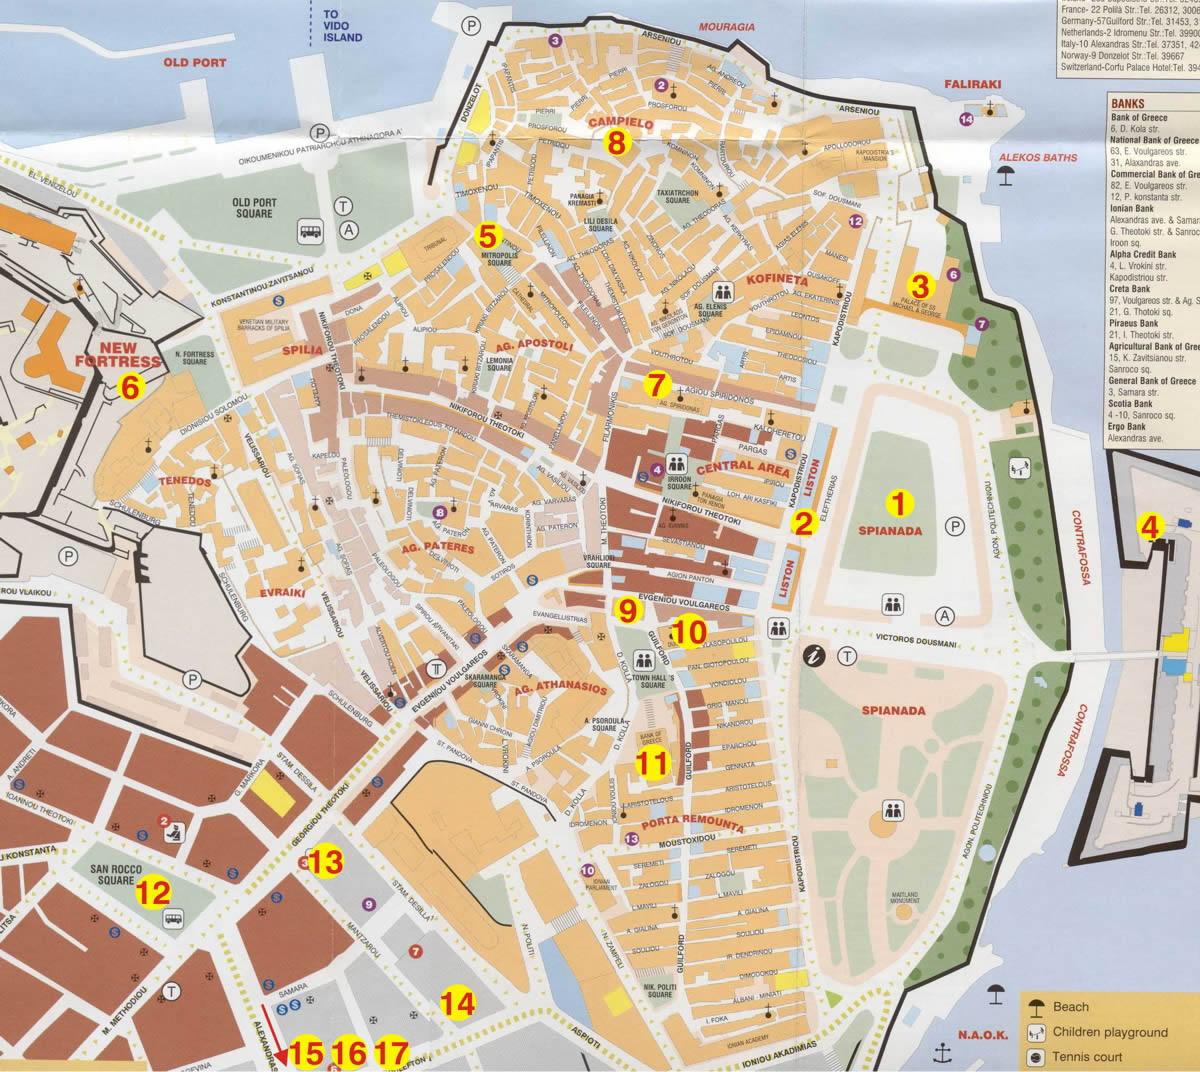 grad krf mapa hotelagent.rs: Znamenitosti grada Krfa grad krf mapa